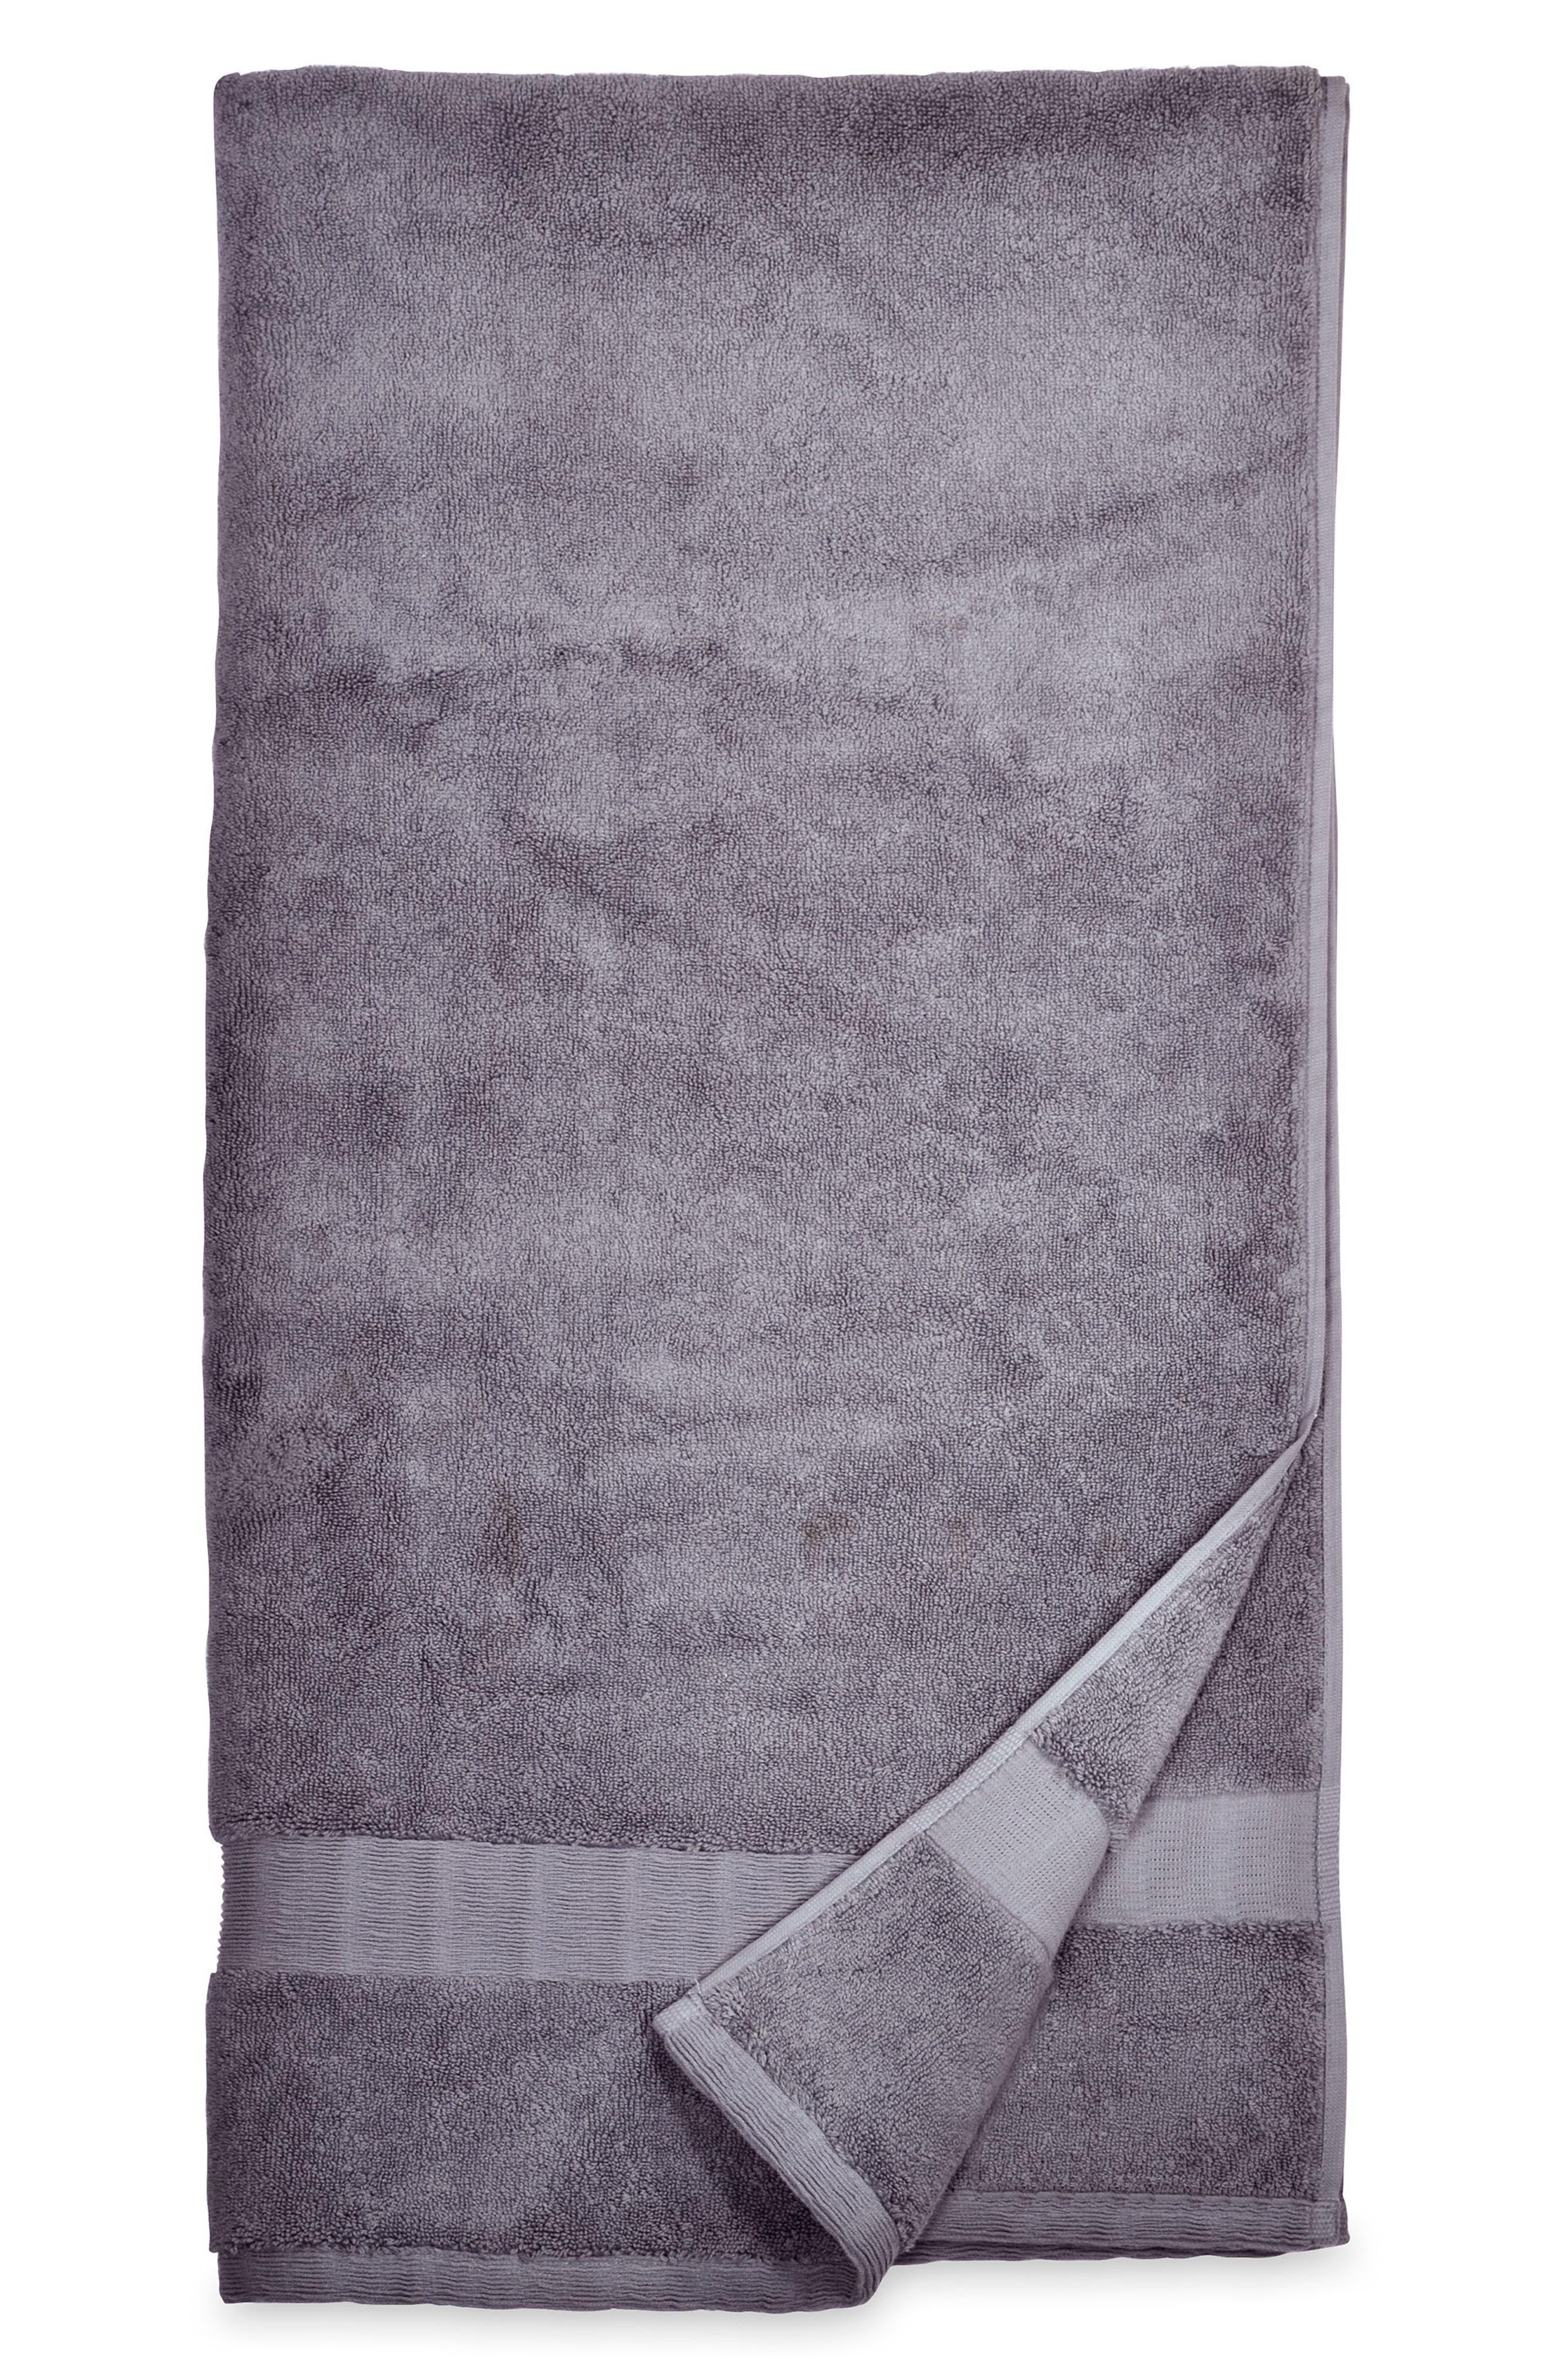 Main Image - DKNY Mercer Bath Towel